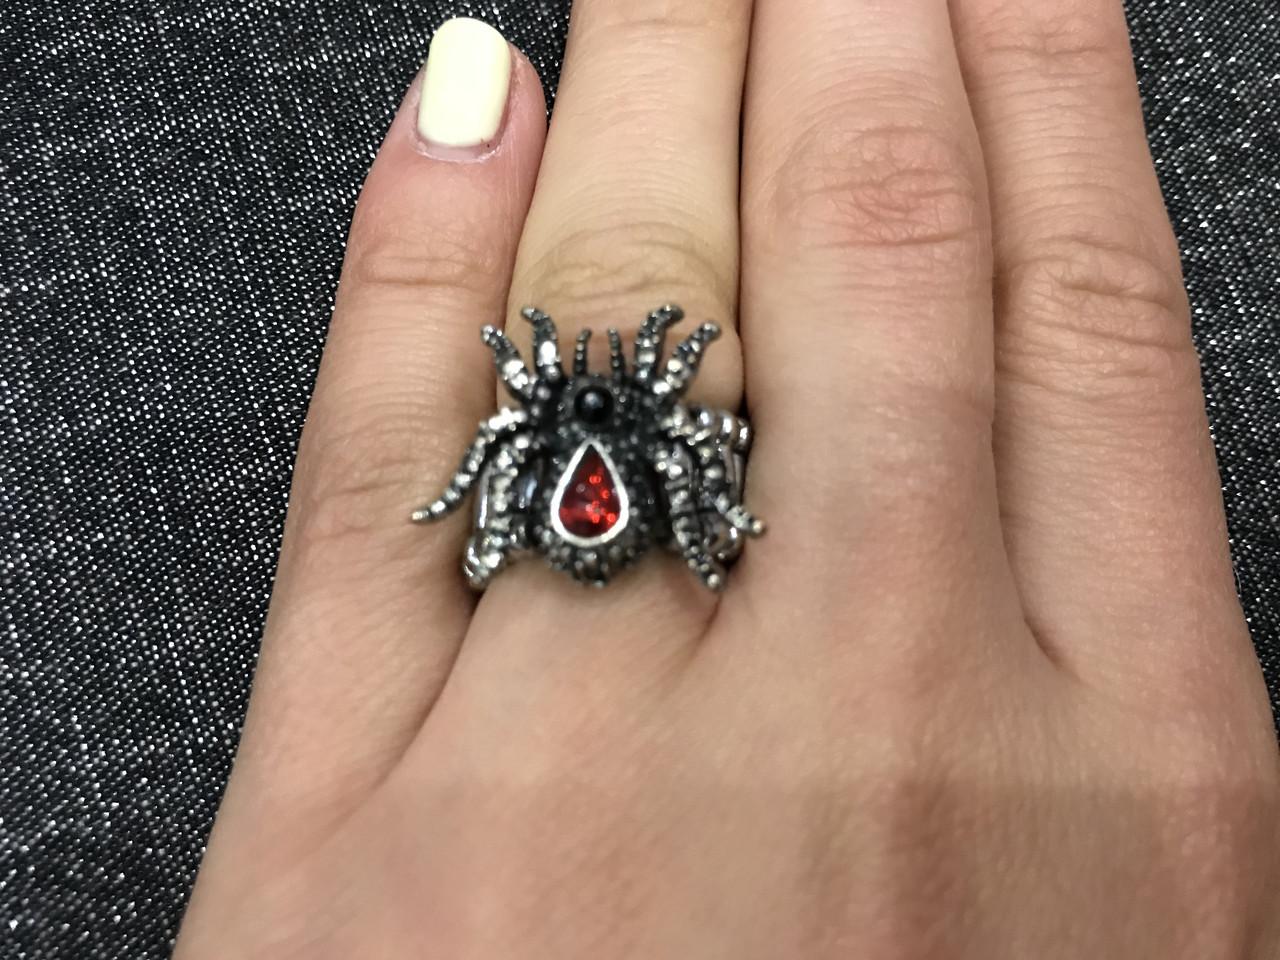 Кільце на гумці (павучок)